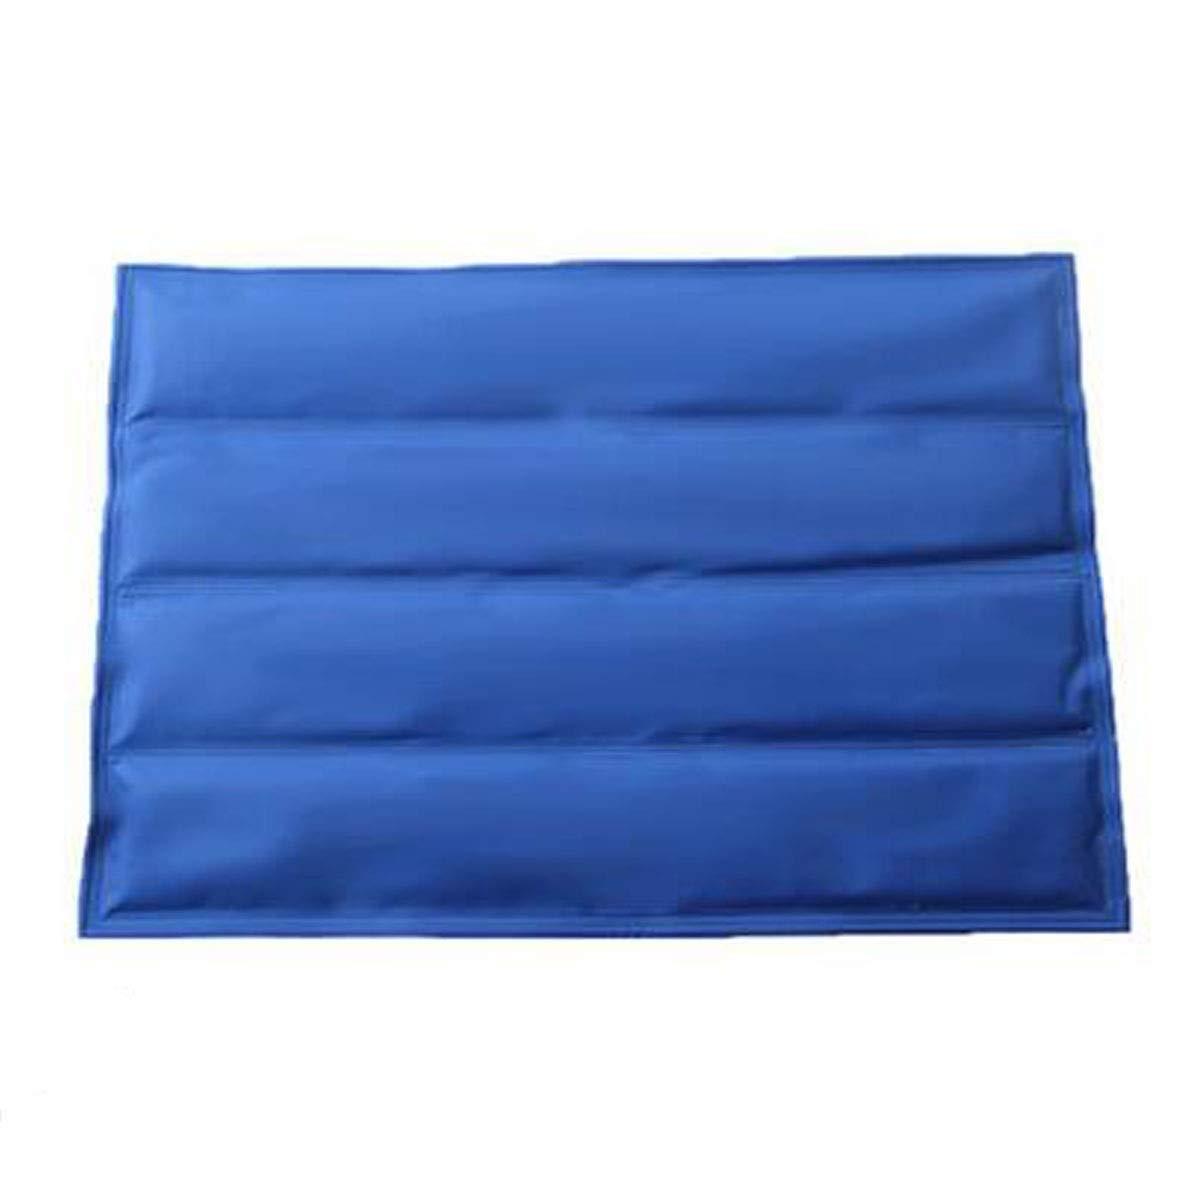 bluee XXL bluee XXL Jiansheng Dog Bed, Dog Cooling Bed, Used For Big Dog Ice Pad, Ultra-thin Cooling Artifact For Sofa Floor Car Sleeping Pad Foldable, color bluee XXL (color   bluee, Size   XXL)